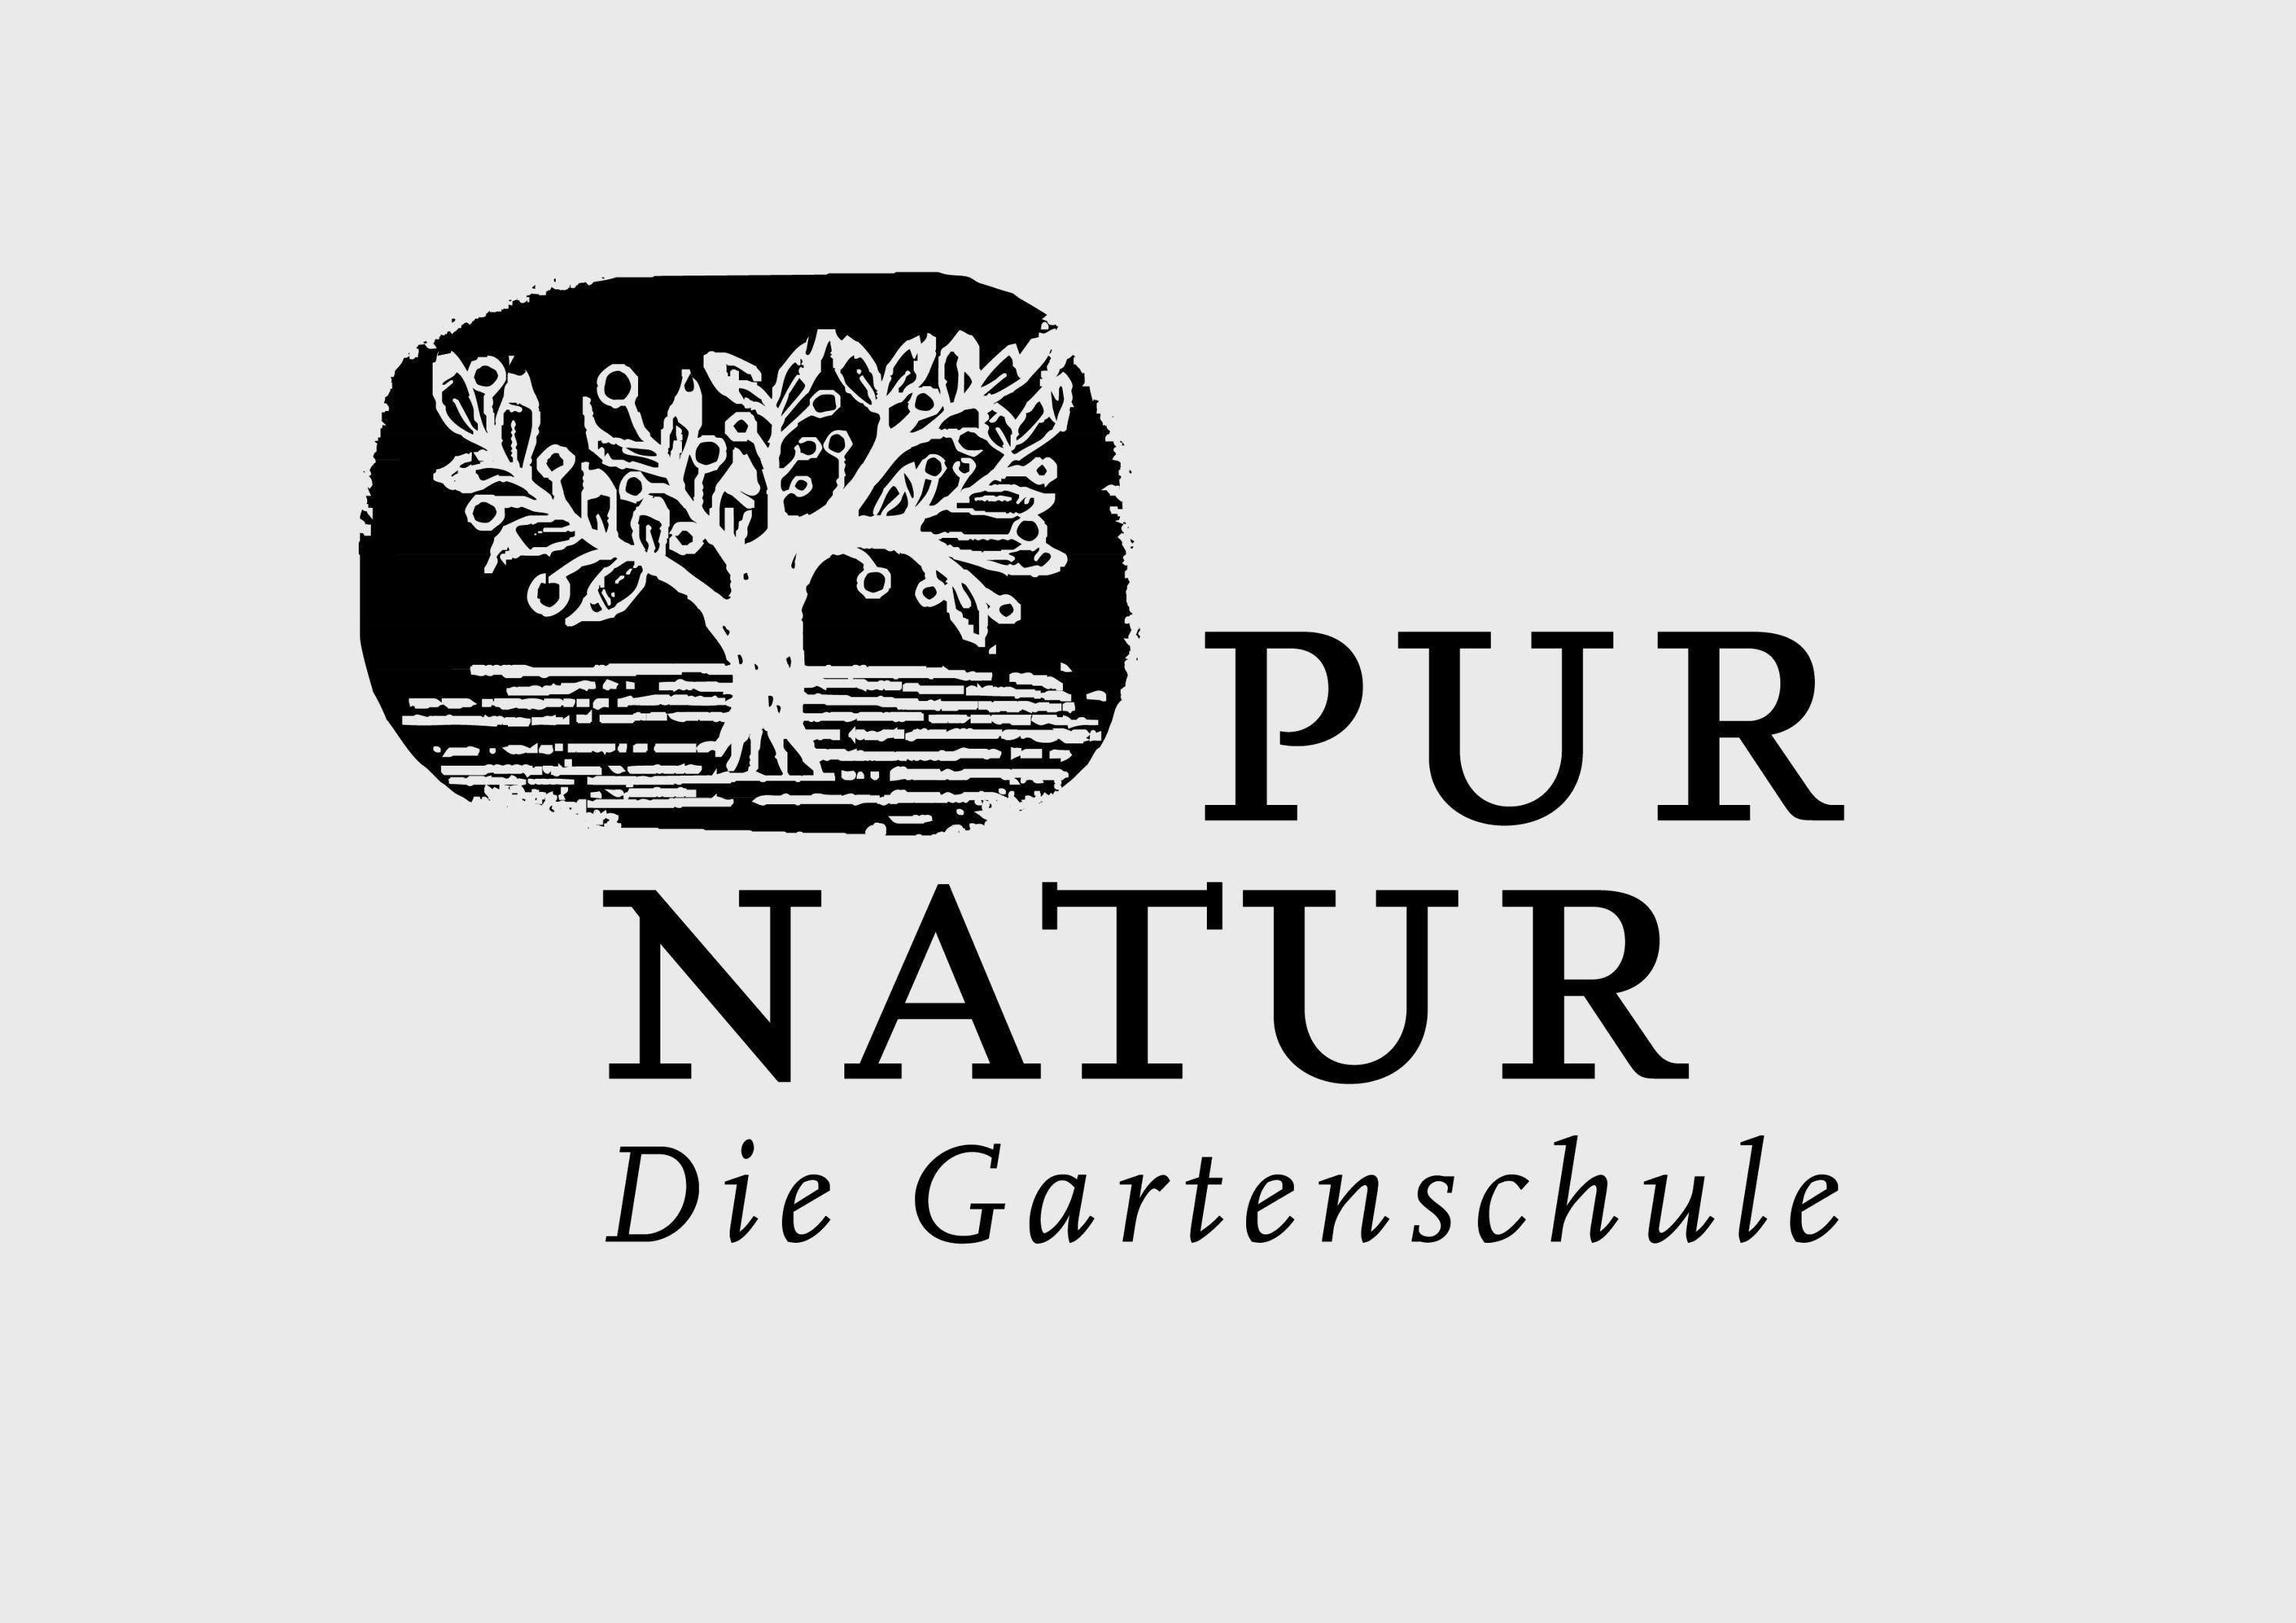 Pur Natur -die Gartenschule-